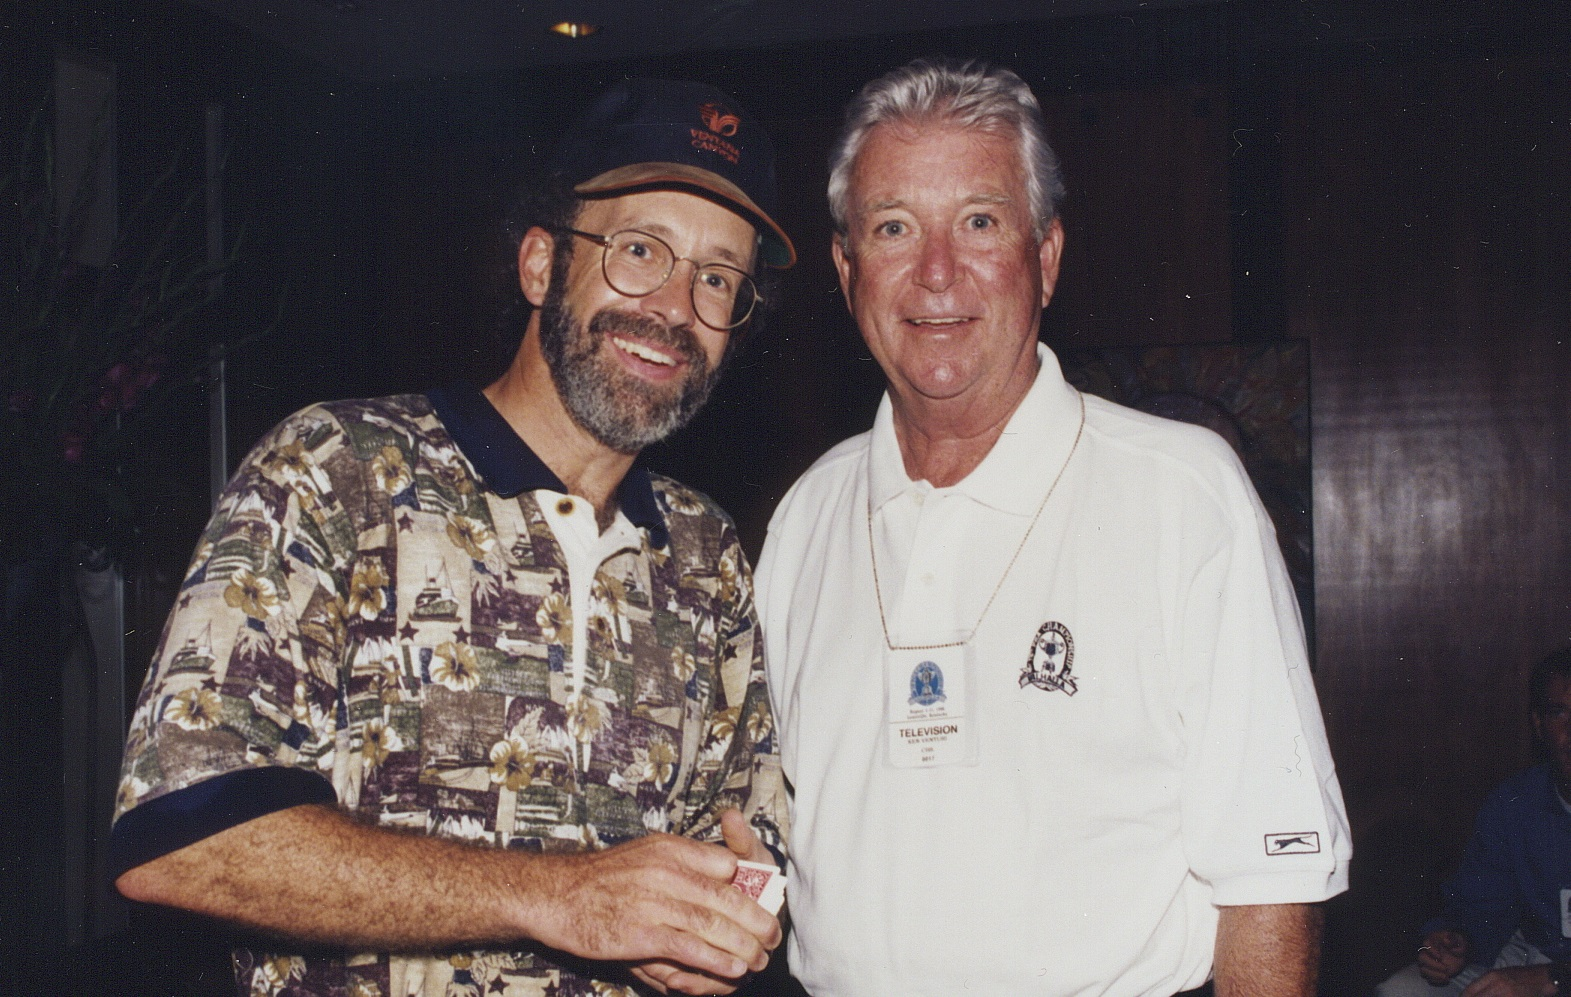 Hondo celebrity PGA Ken Venturi @ Valhalla '96.jpg